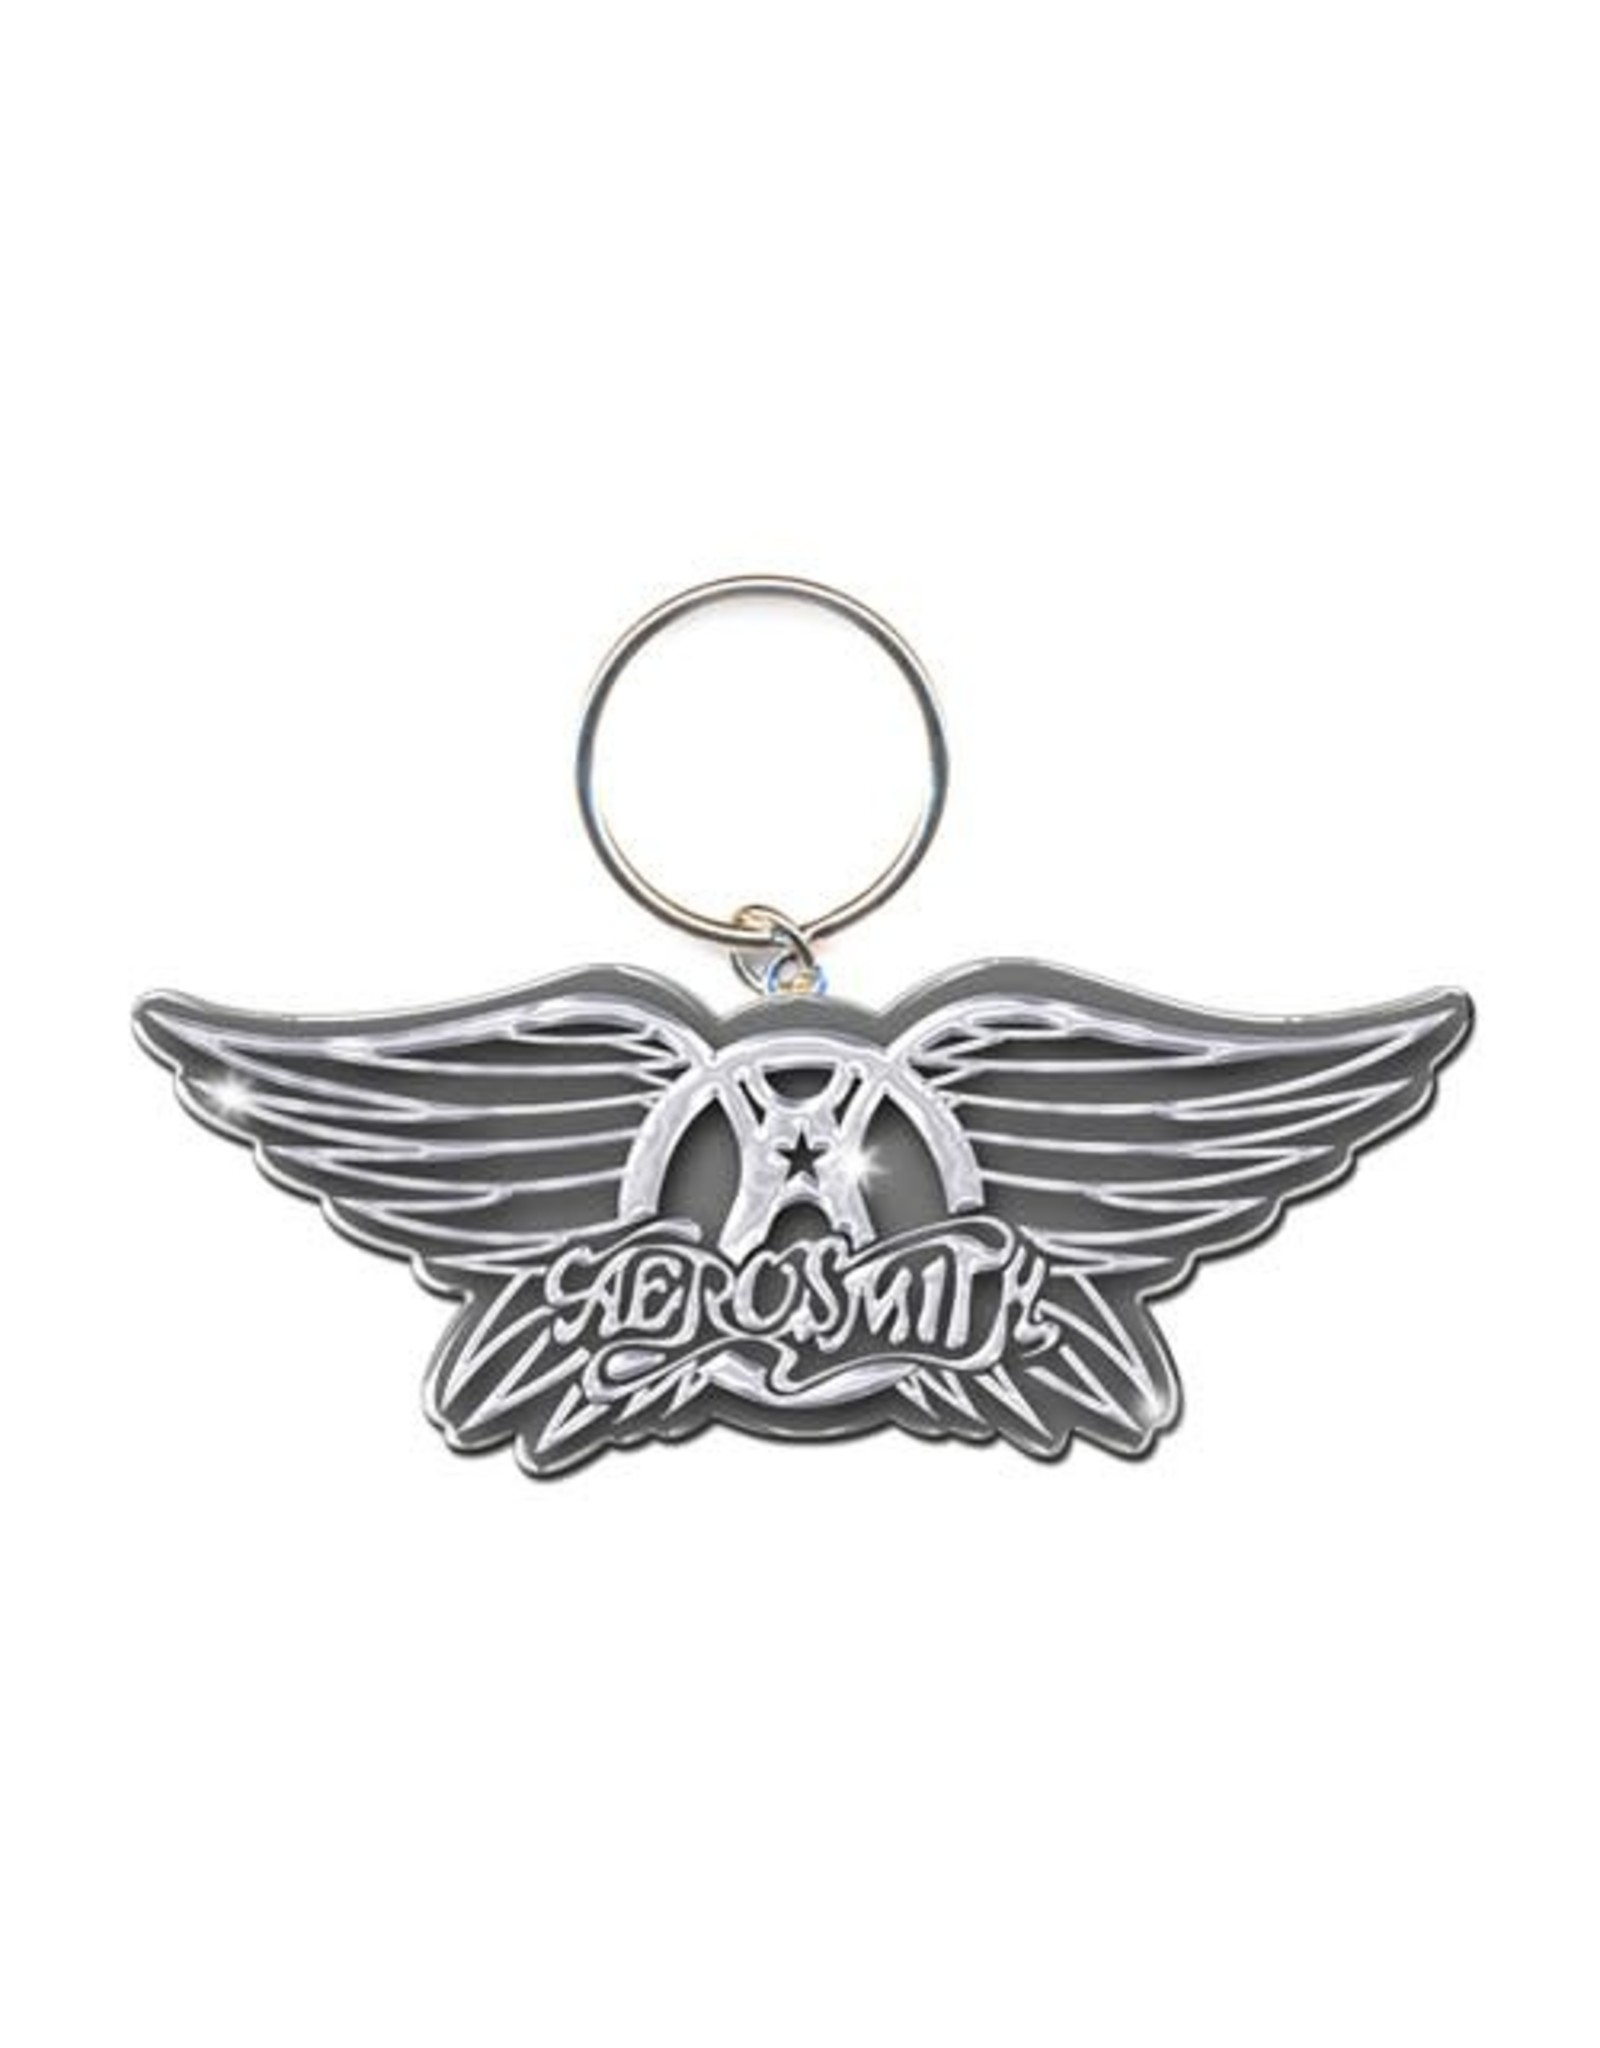 Aerosmith / Classic Wings Logo Keychain